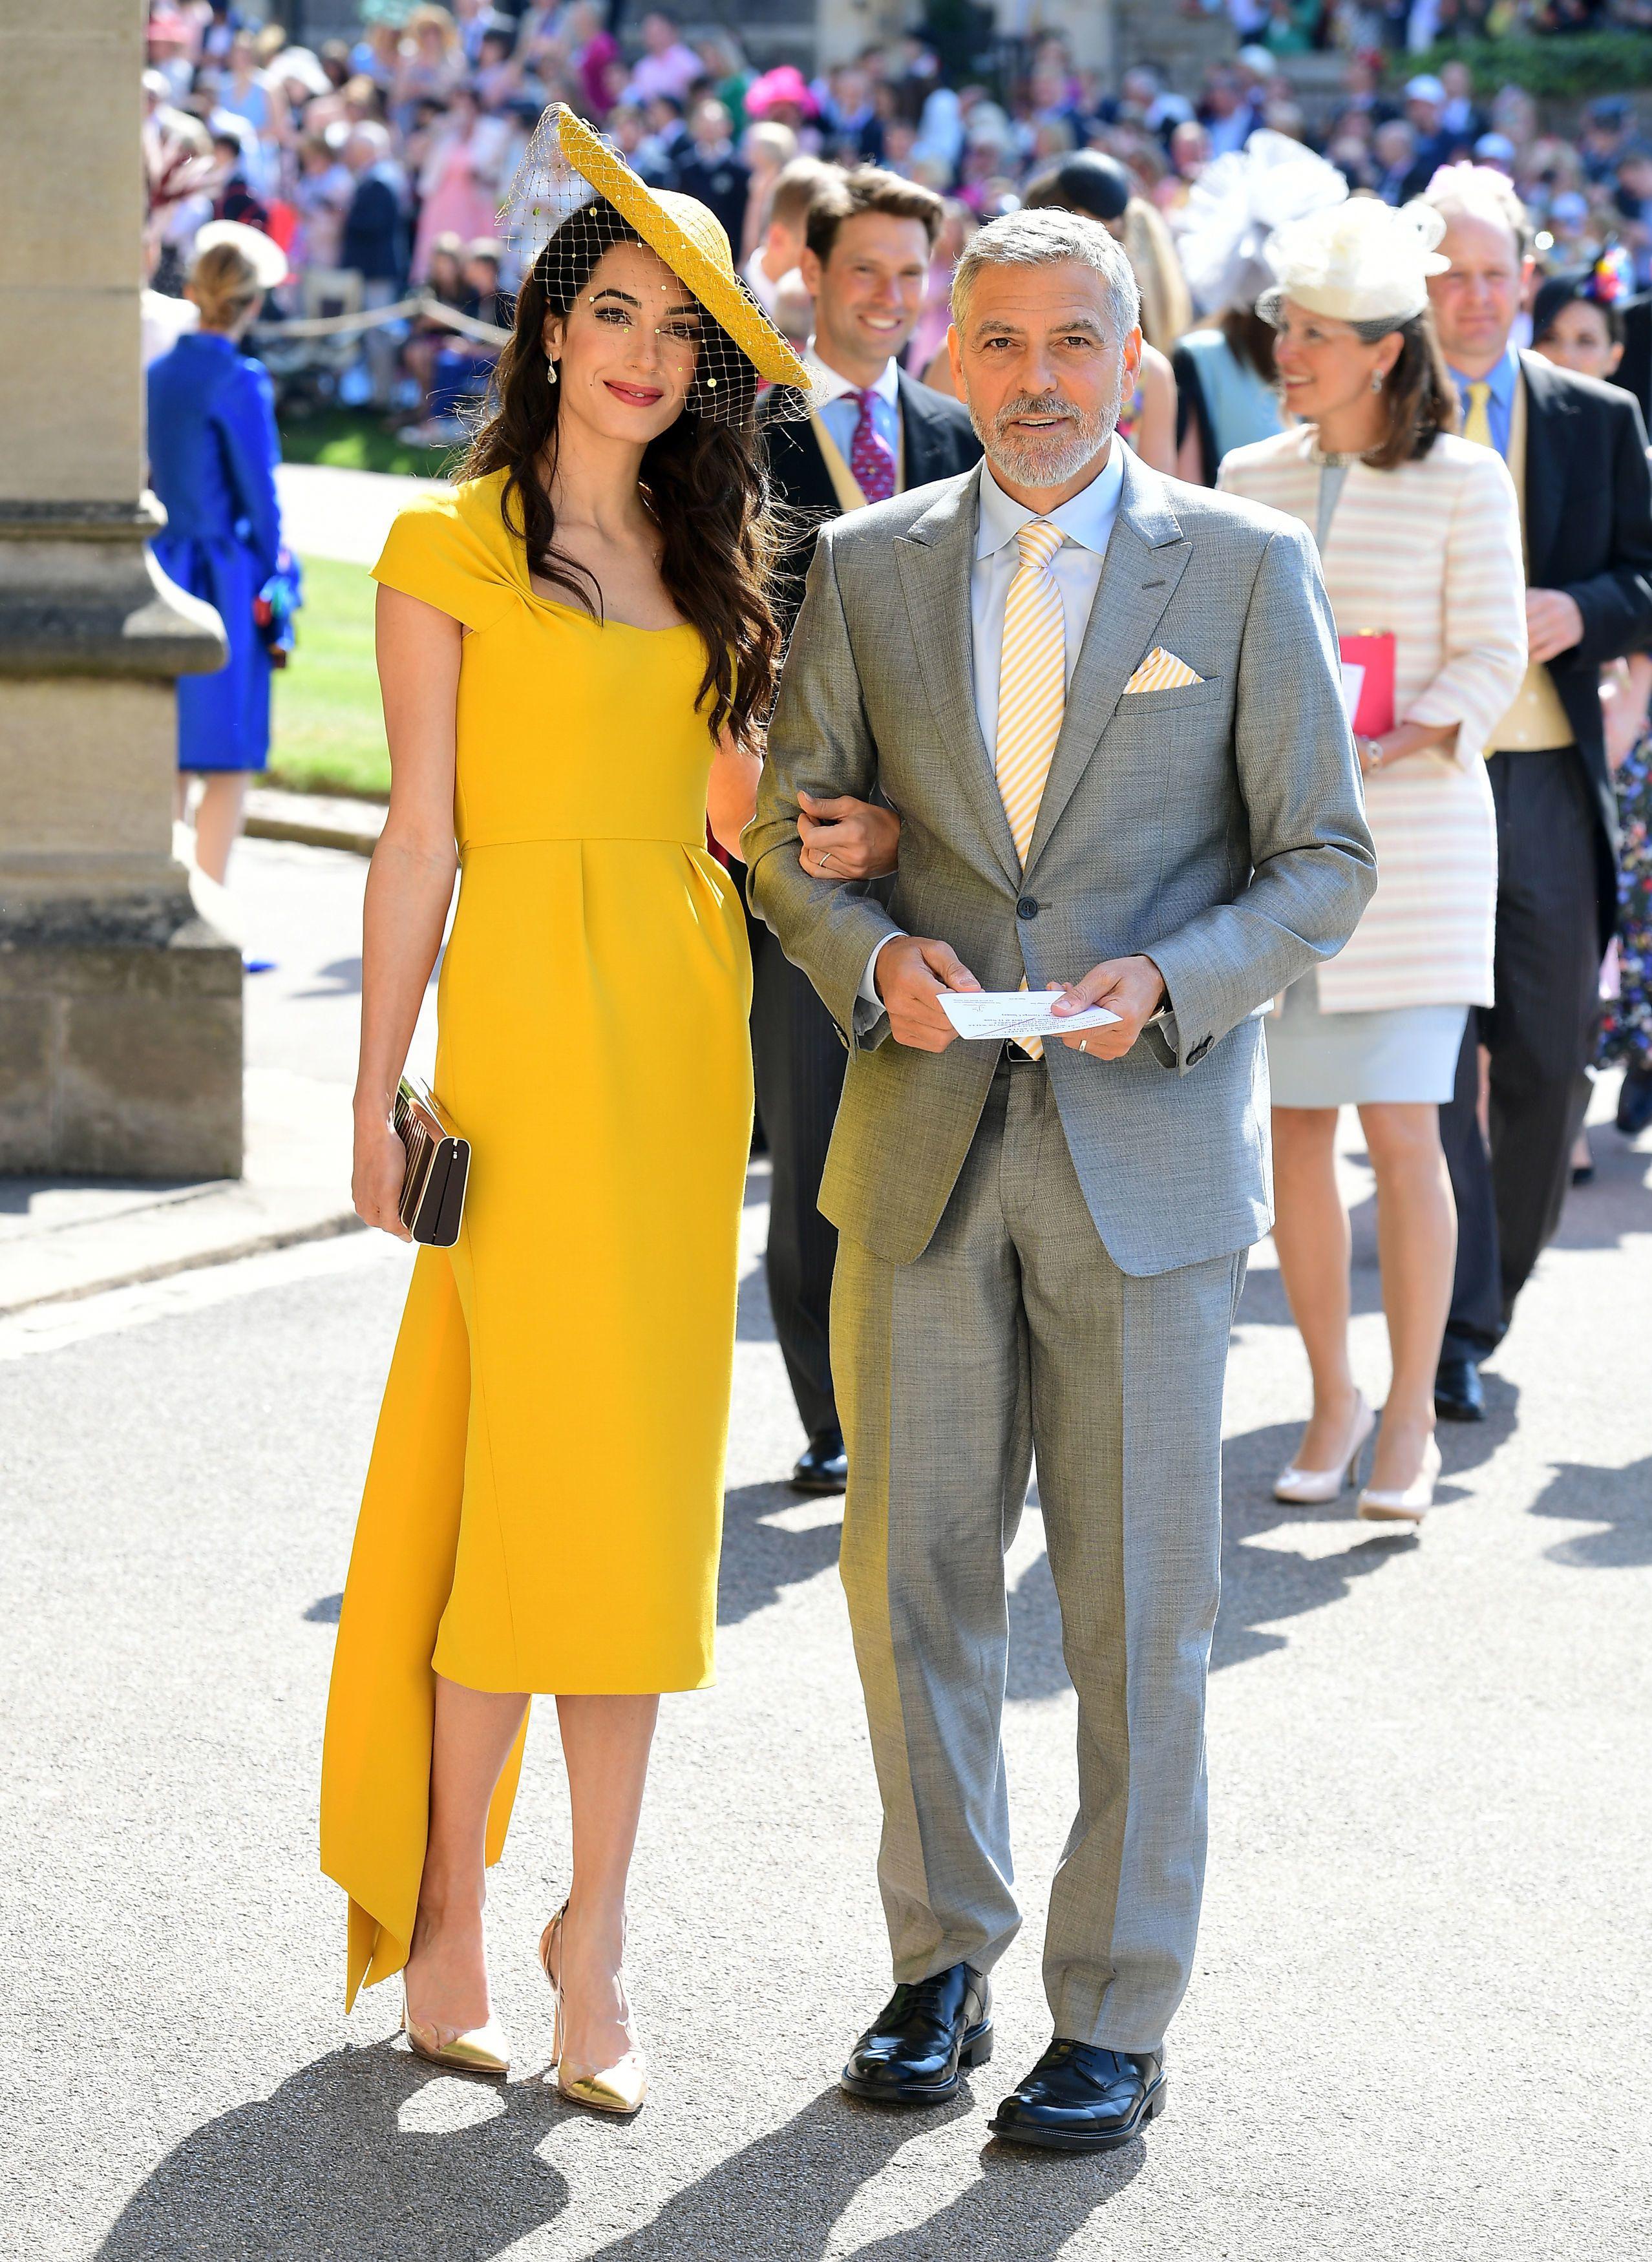 Prince Harry Wedding.Royal Wedding Best Dressed List Prince Harry And Meghan Markle